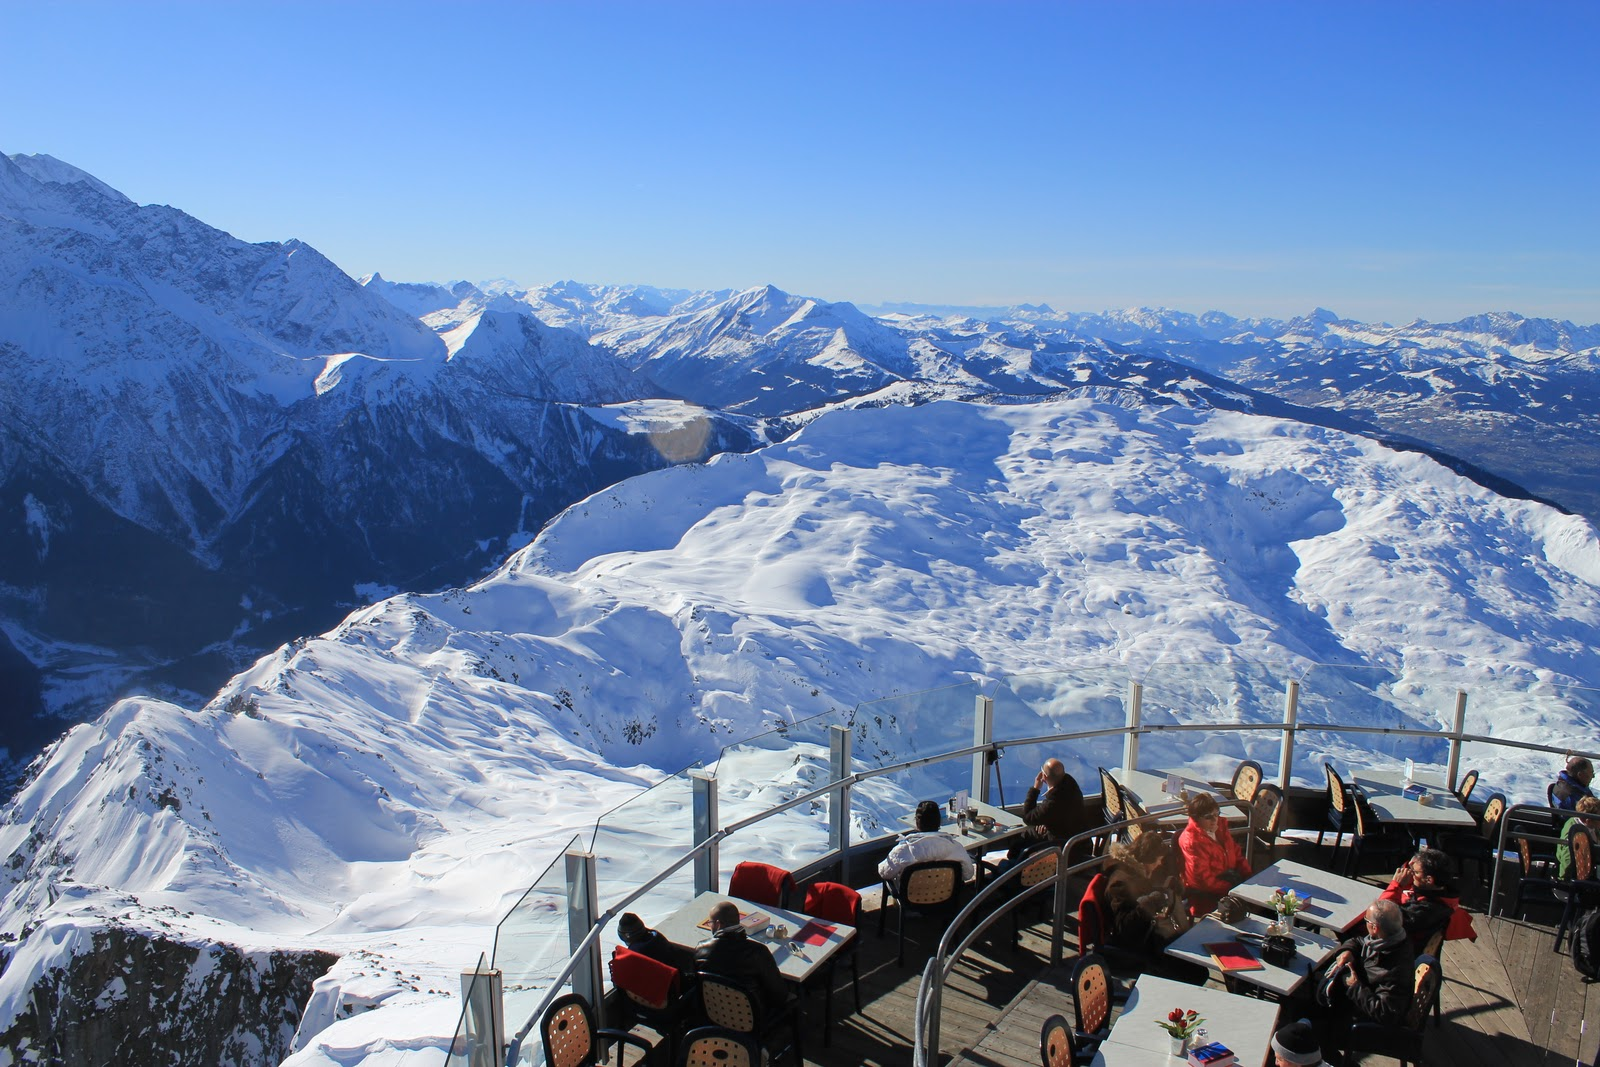 Restaurante Le Panoramic em Chamonix